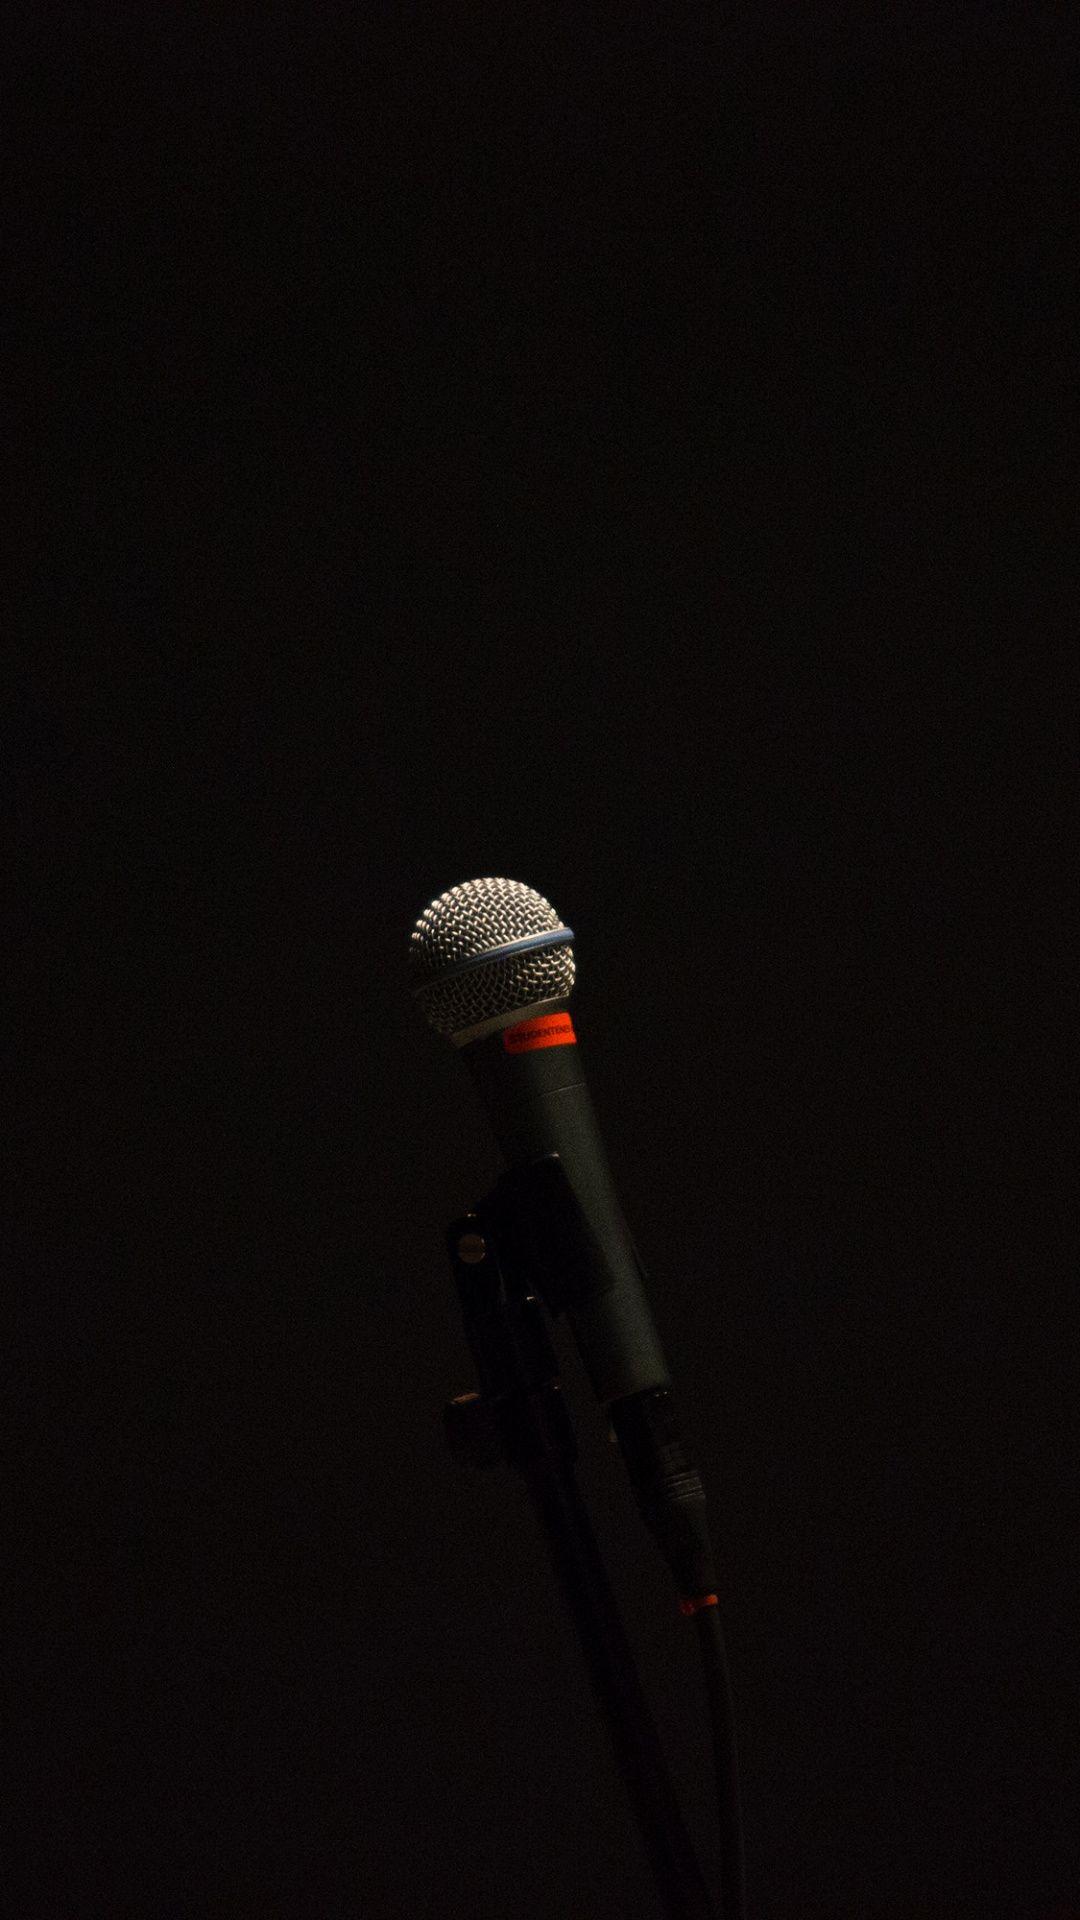 Wallpapers Darkness Technology Microphone Creative Arts Tech